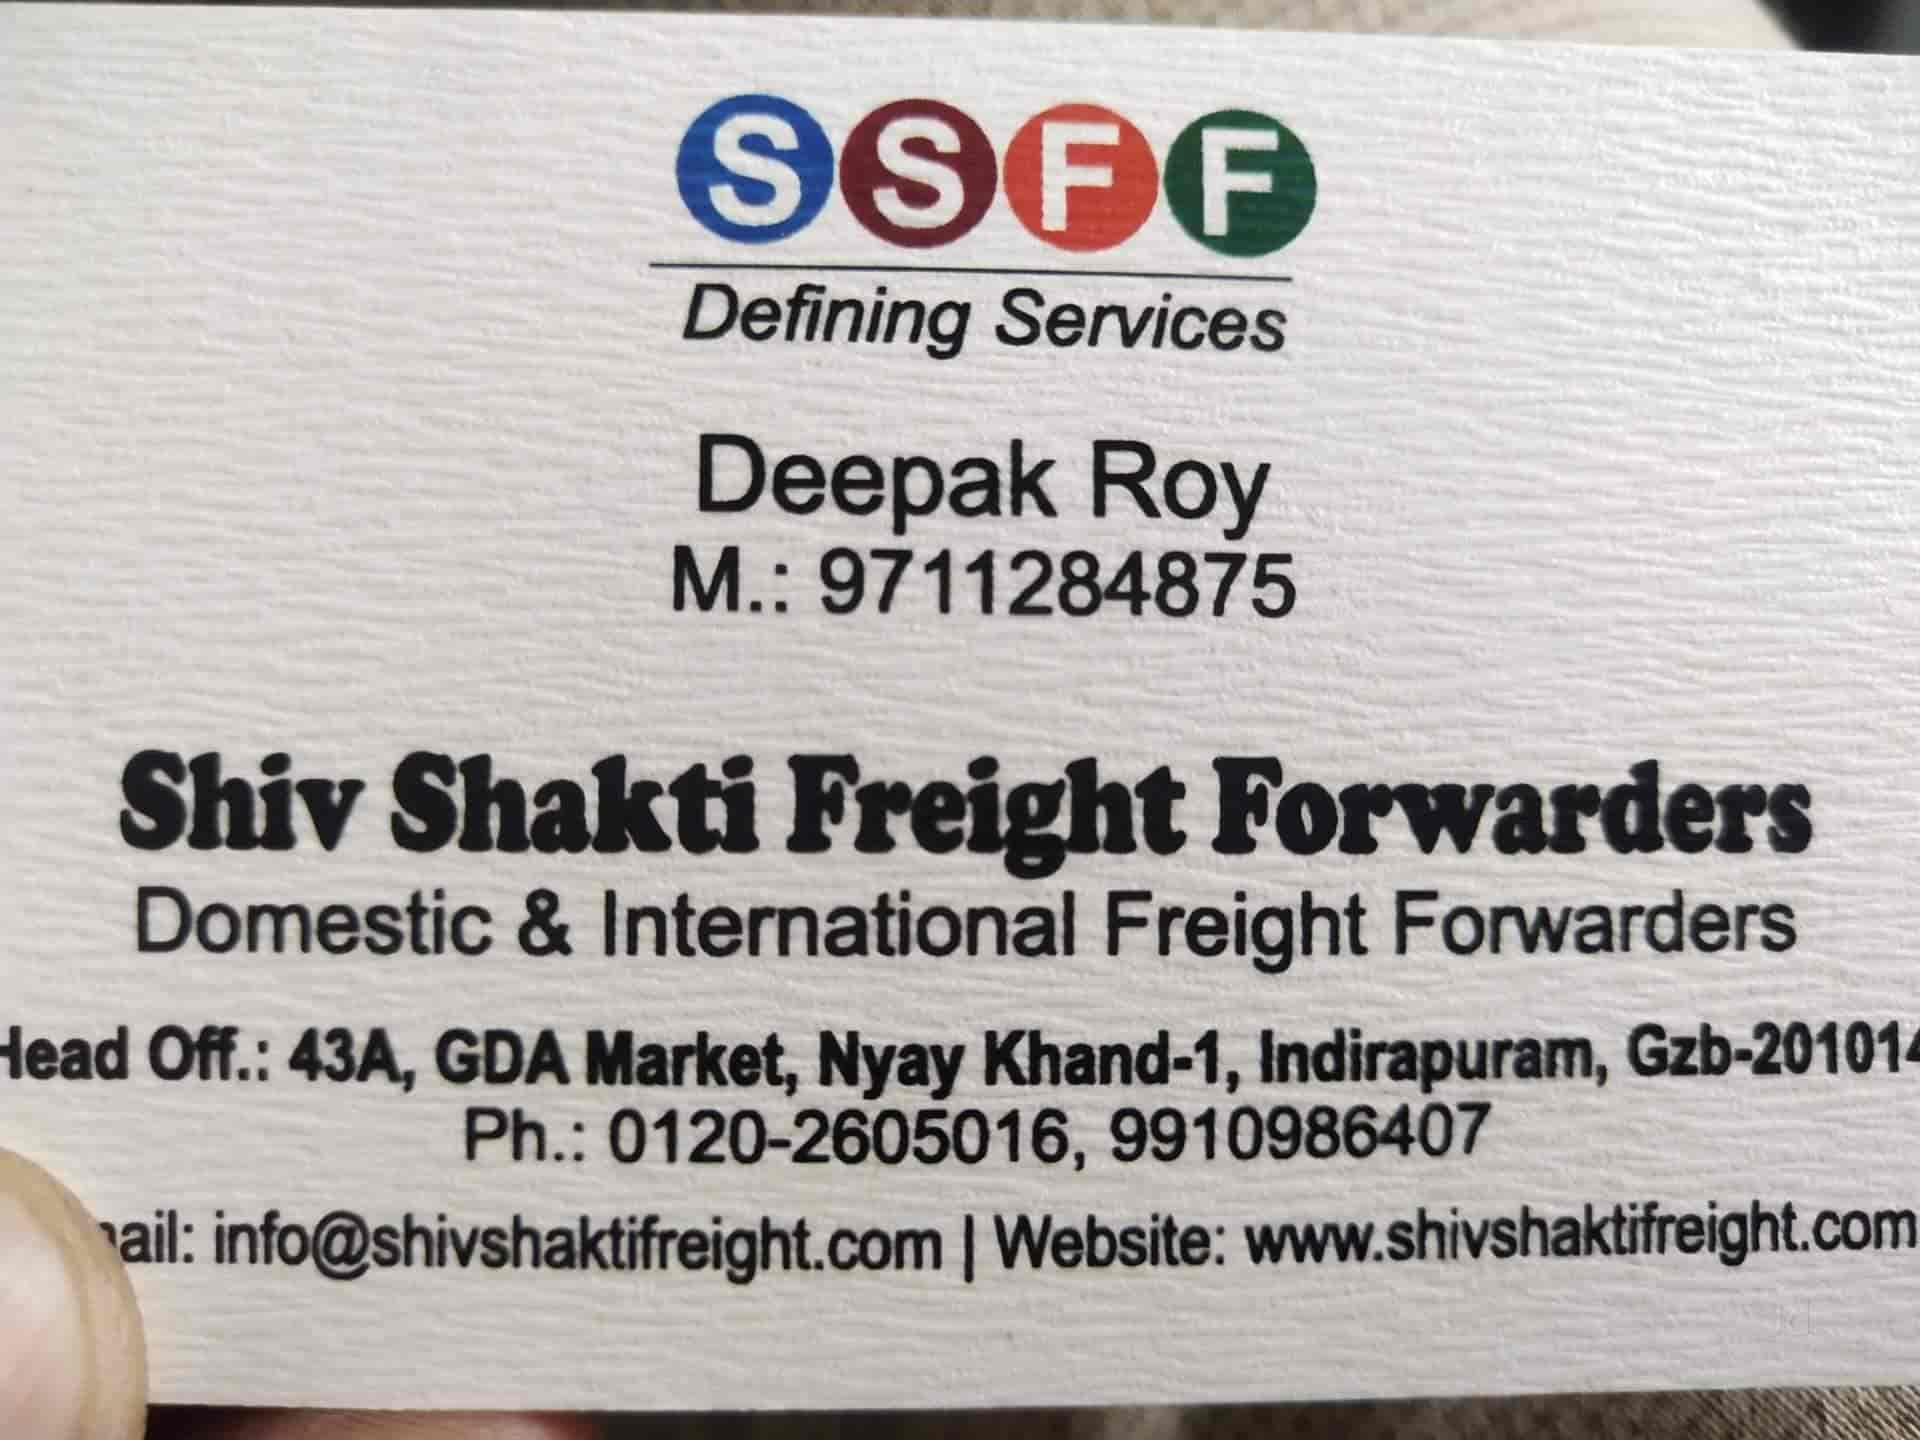 Shiv Shakti Freight Forwarders Photos, Indirapuram